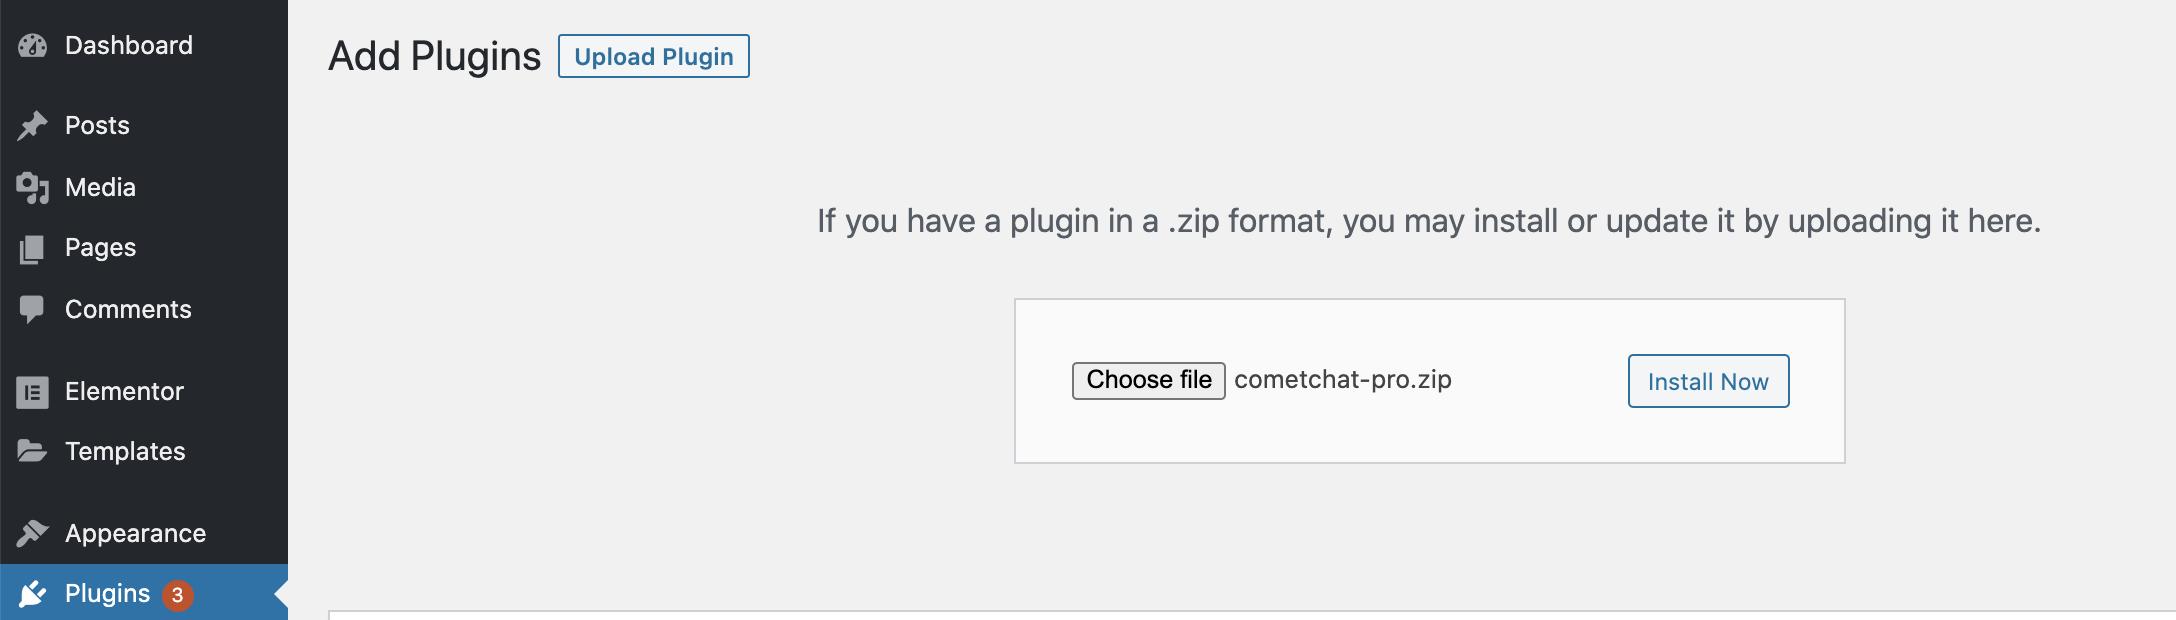 Upload Plugin > Choose File > Install Now